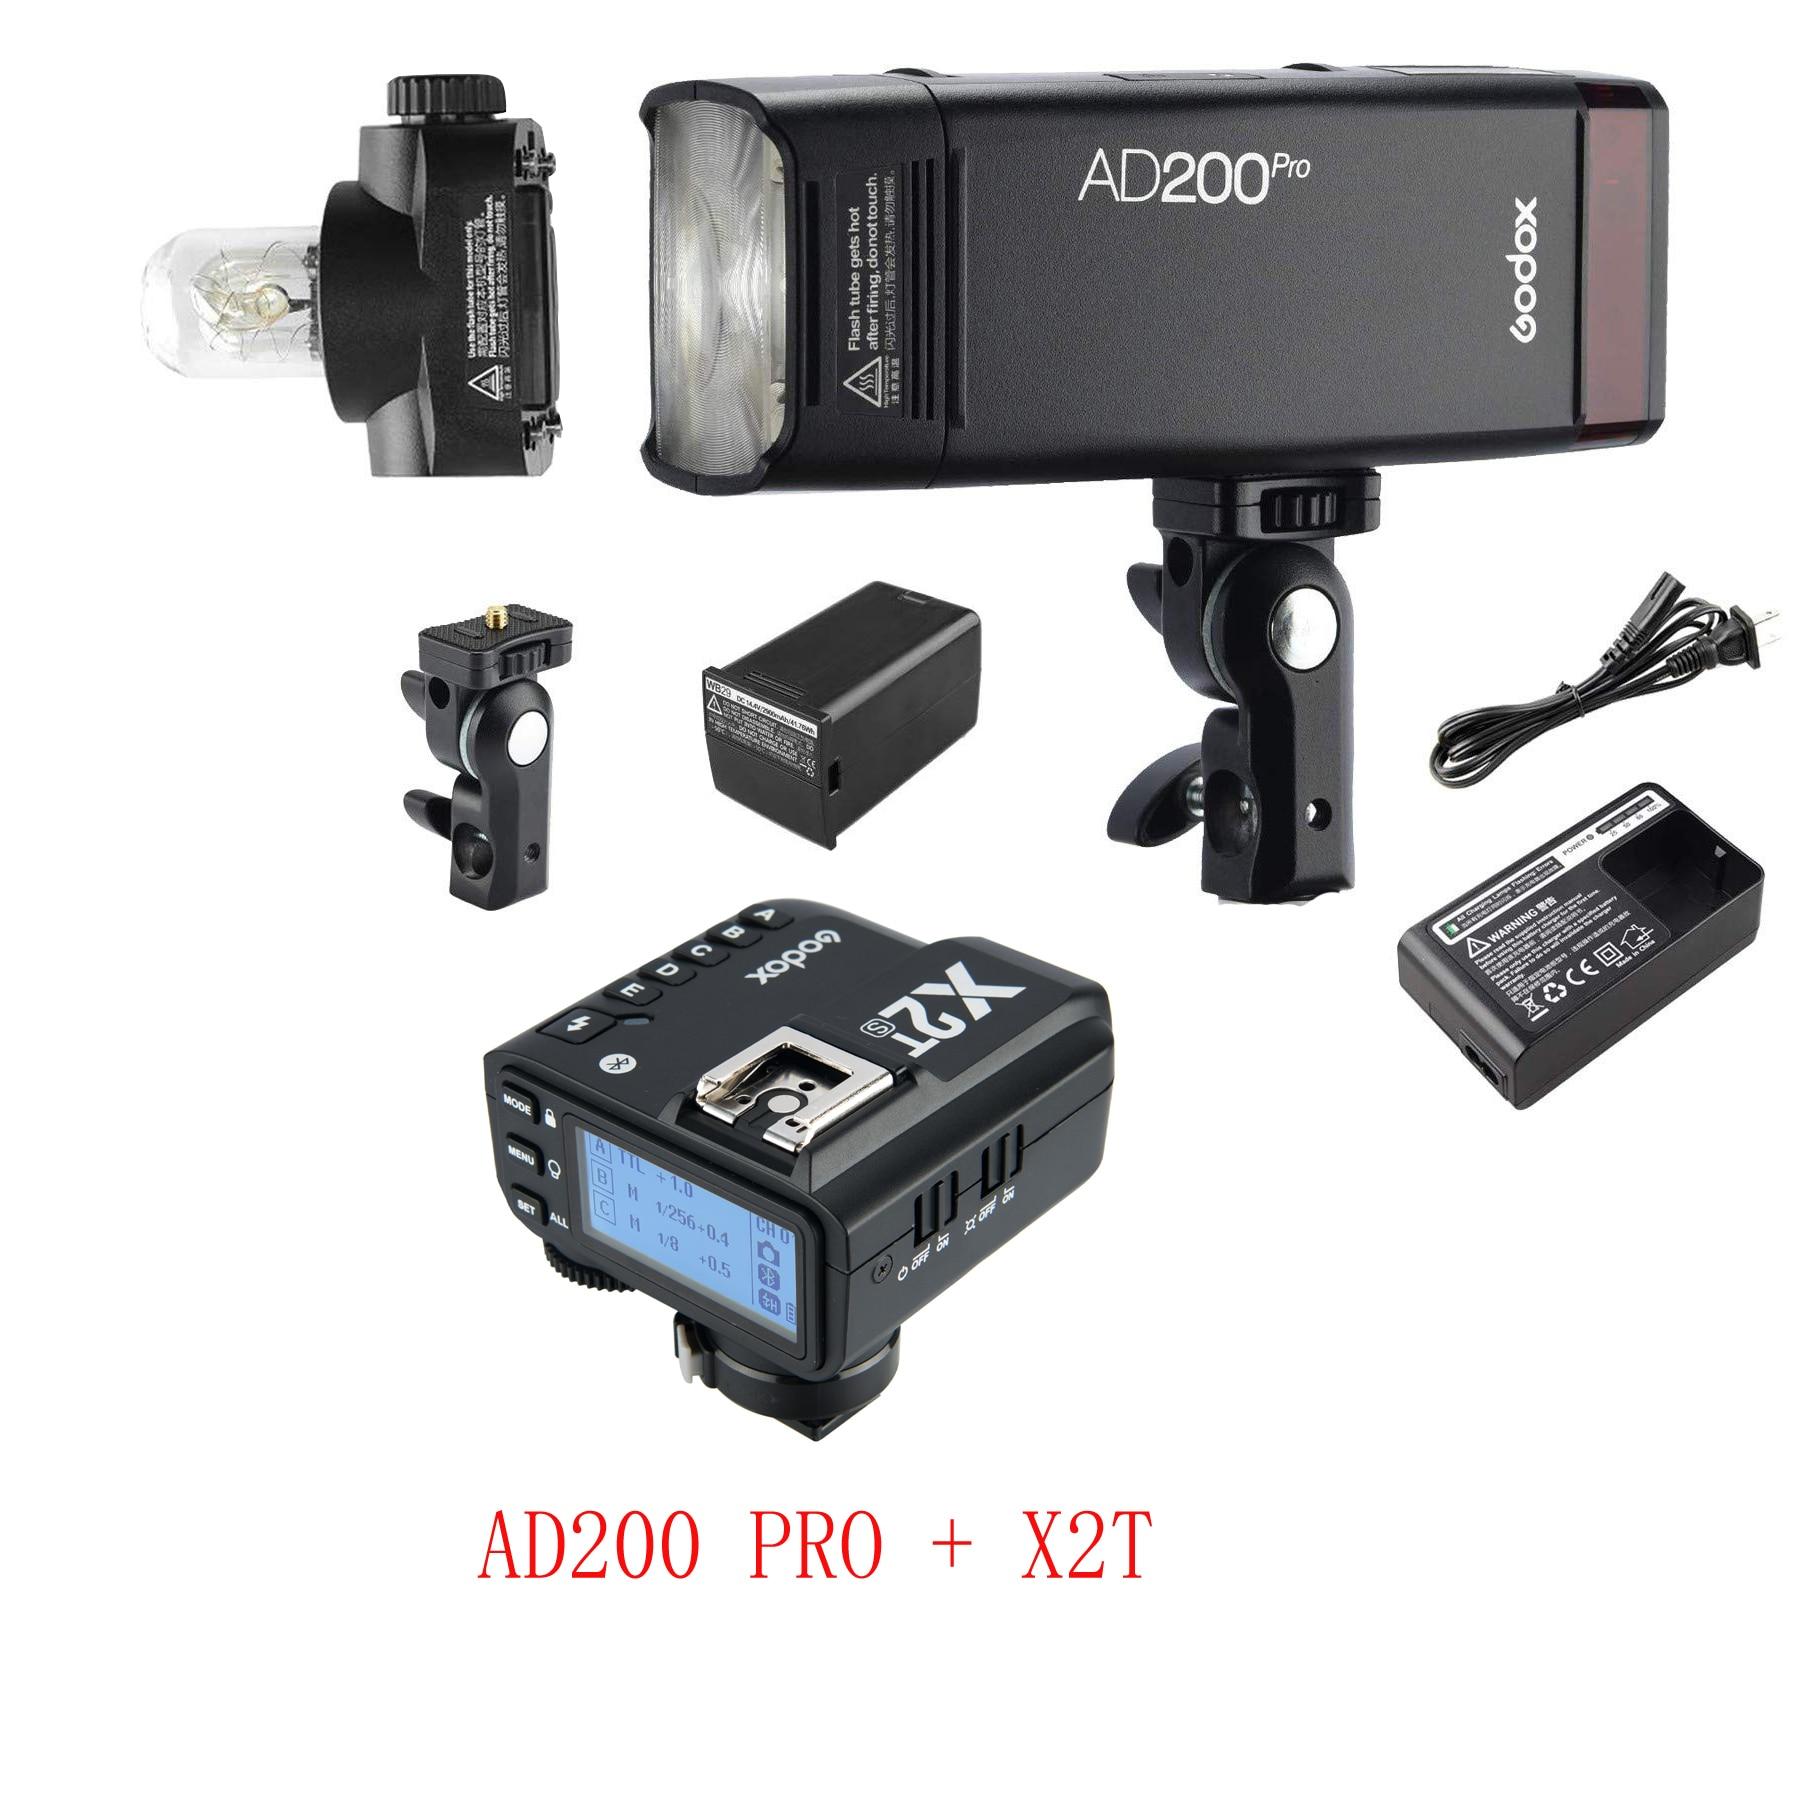 Godox AD200Pro 200ws TTL 2.4G 1//8000 HSS 500 Full Power Flash Speedlite with Godox XPro-F TTL Wireless Flash Trigger for Fuji Cameras